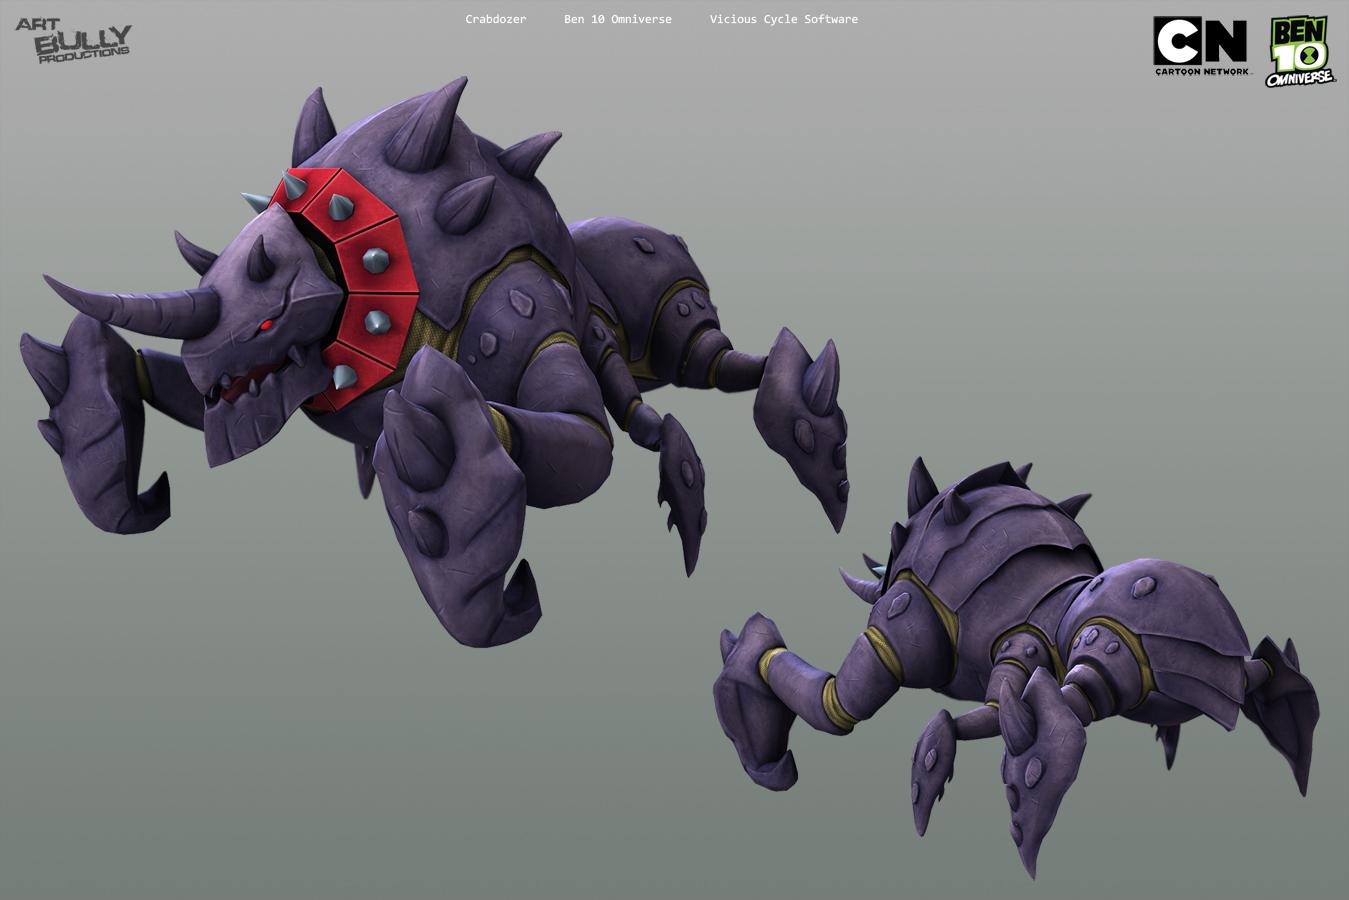 CrabdozerABP.jpg